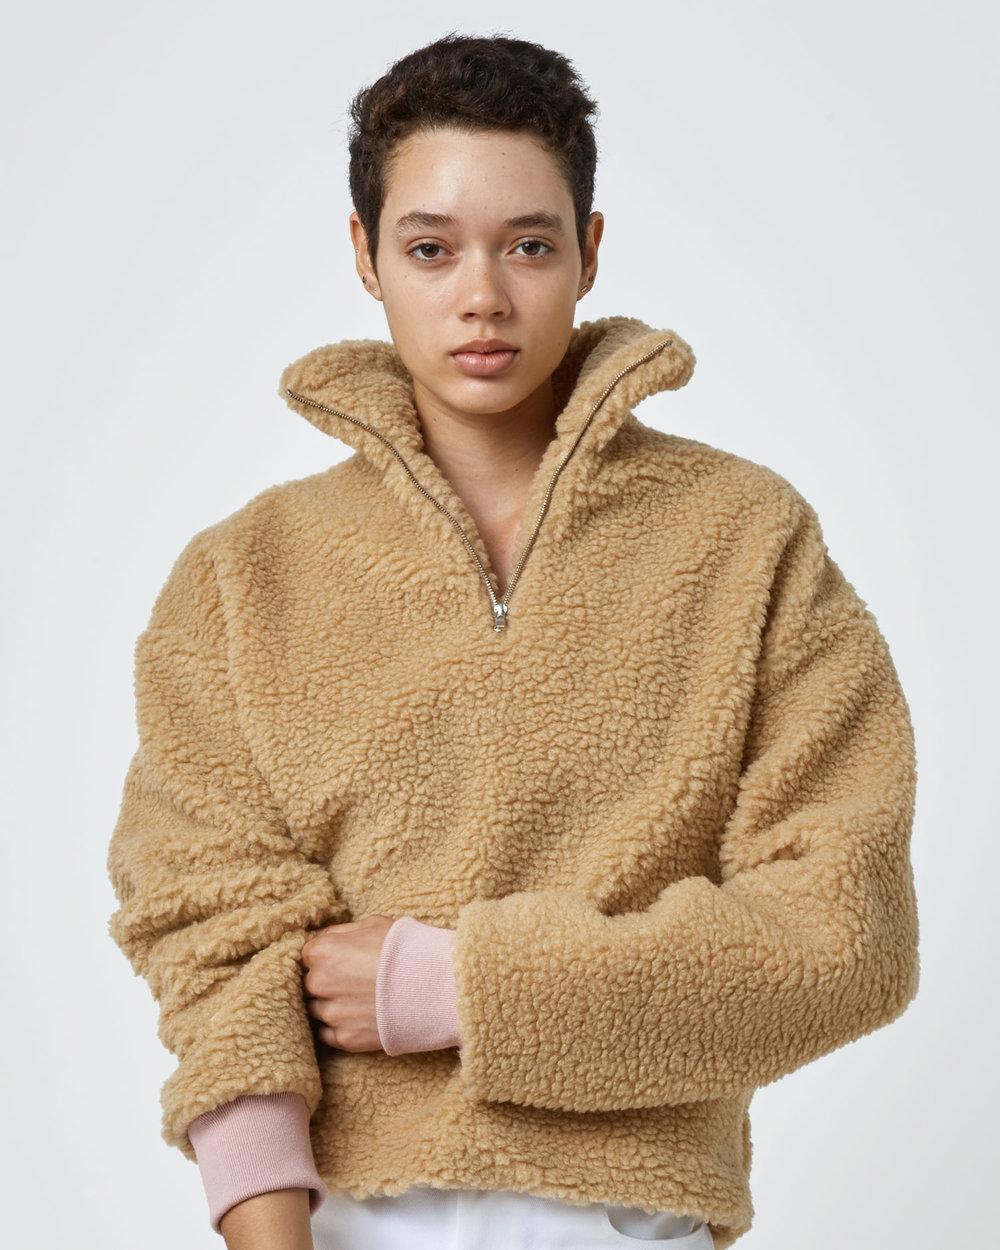 Shop One DNA Sherpa Fleece Half-zip in Camel with Pink Cuffs